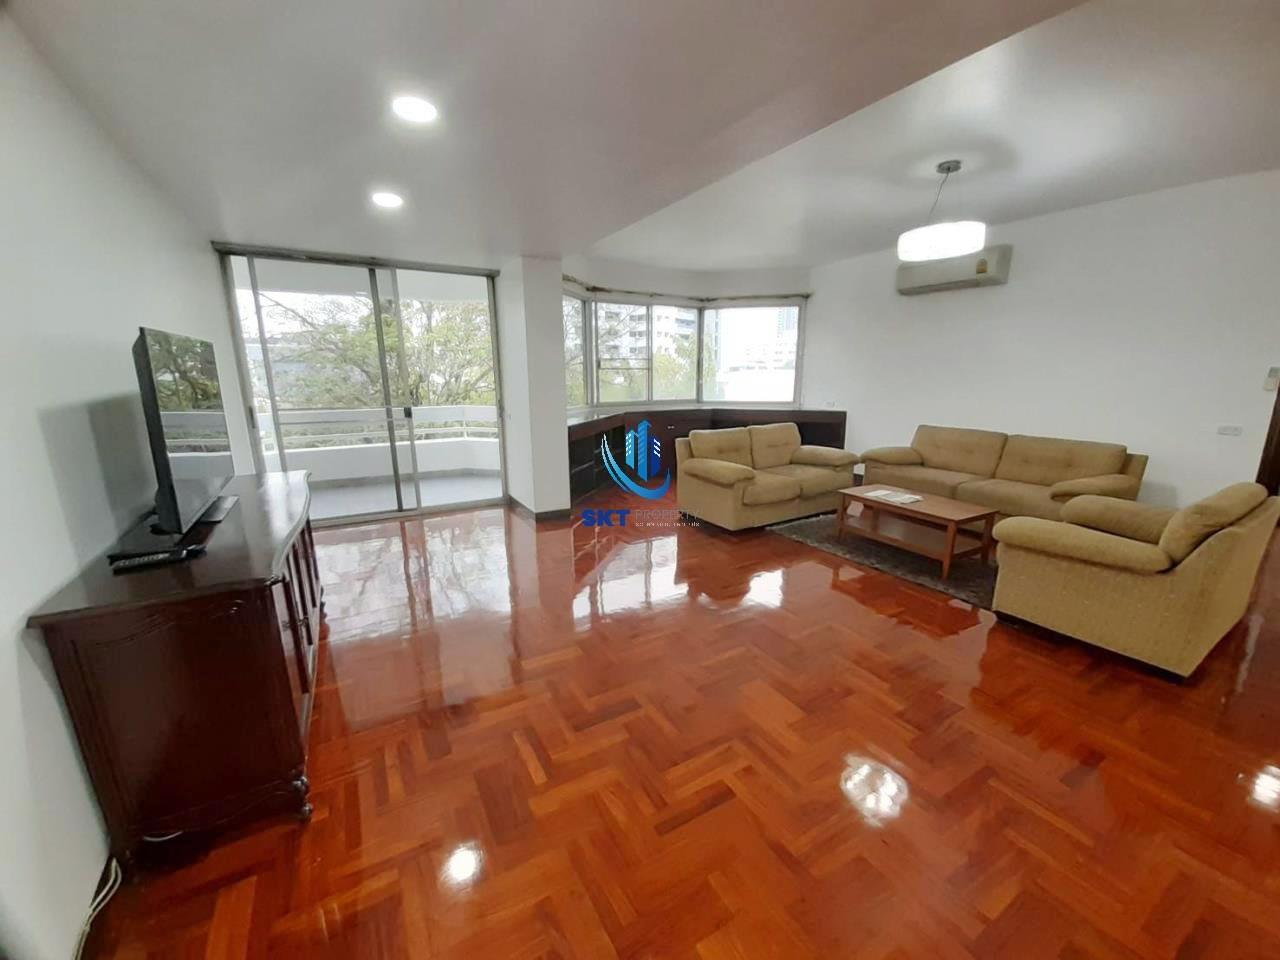 Sukritta Property Agency's Kanta mansion sukhumvit 26 - Bts Prompong 1